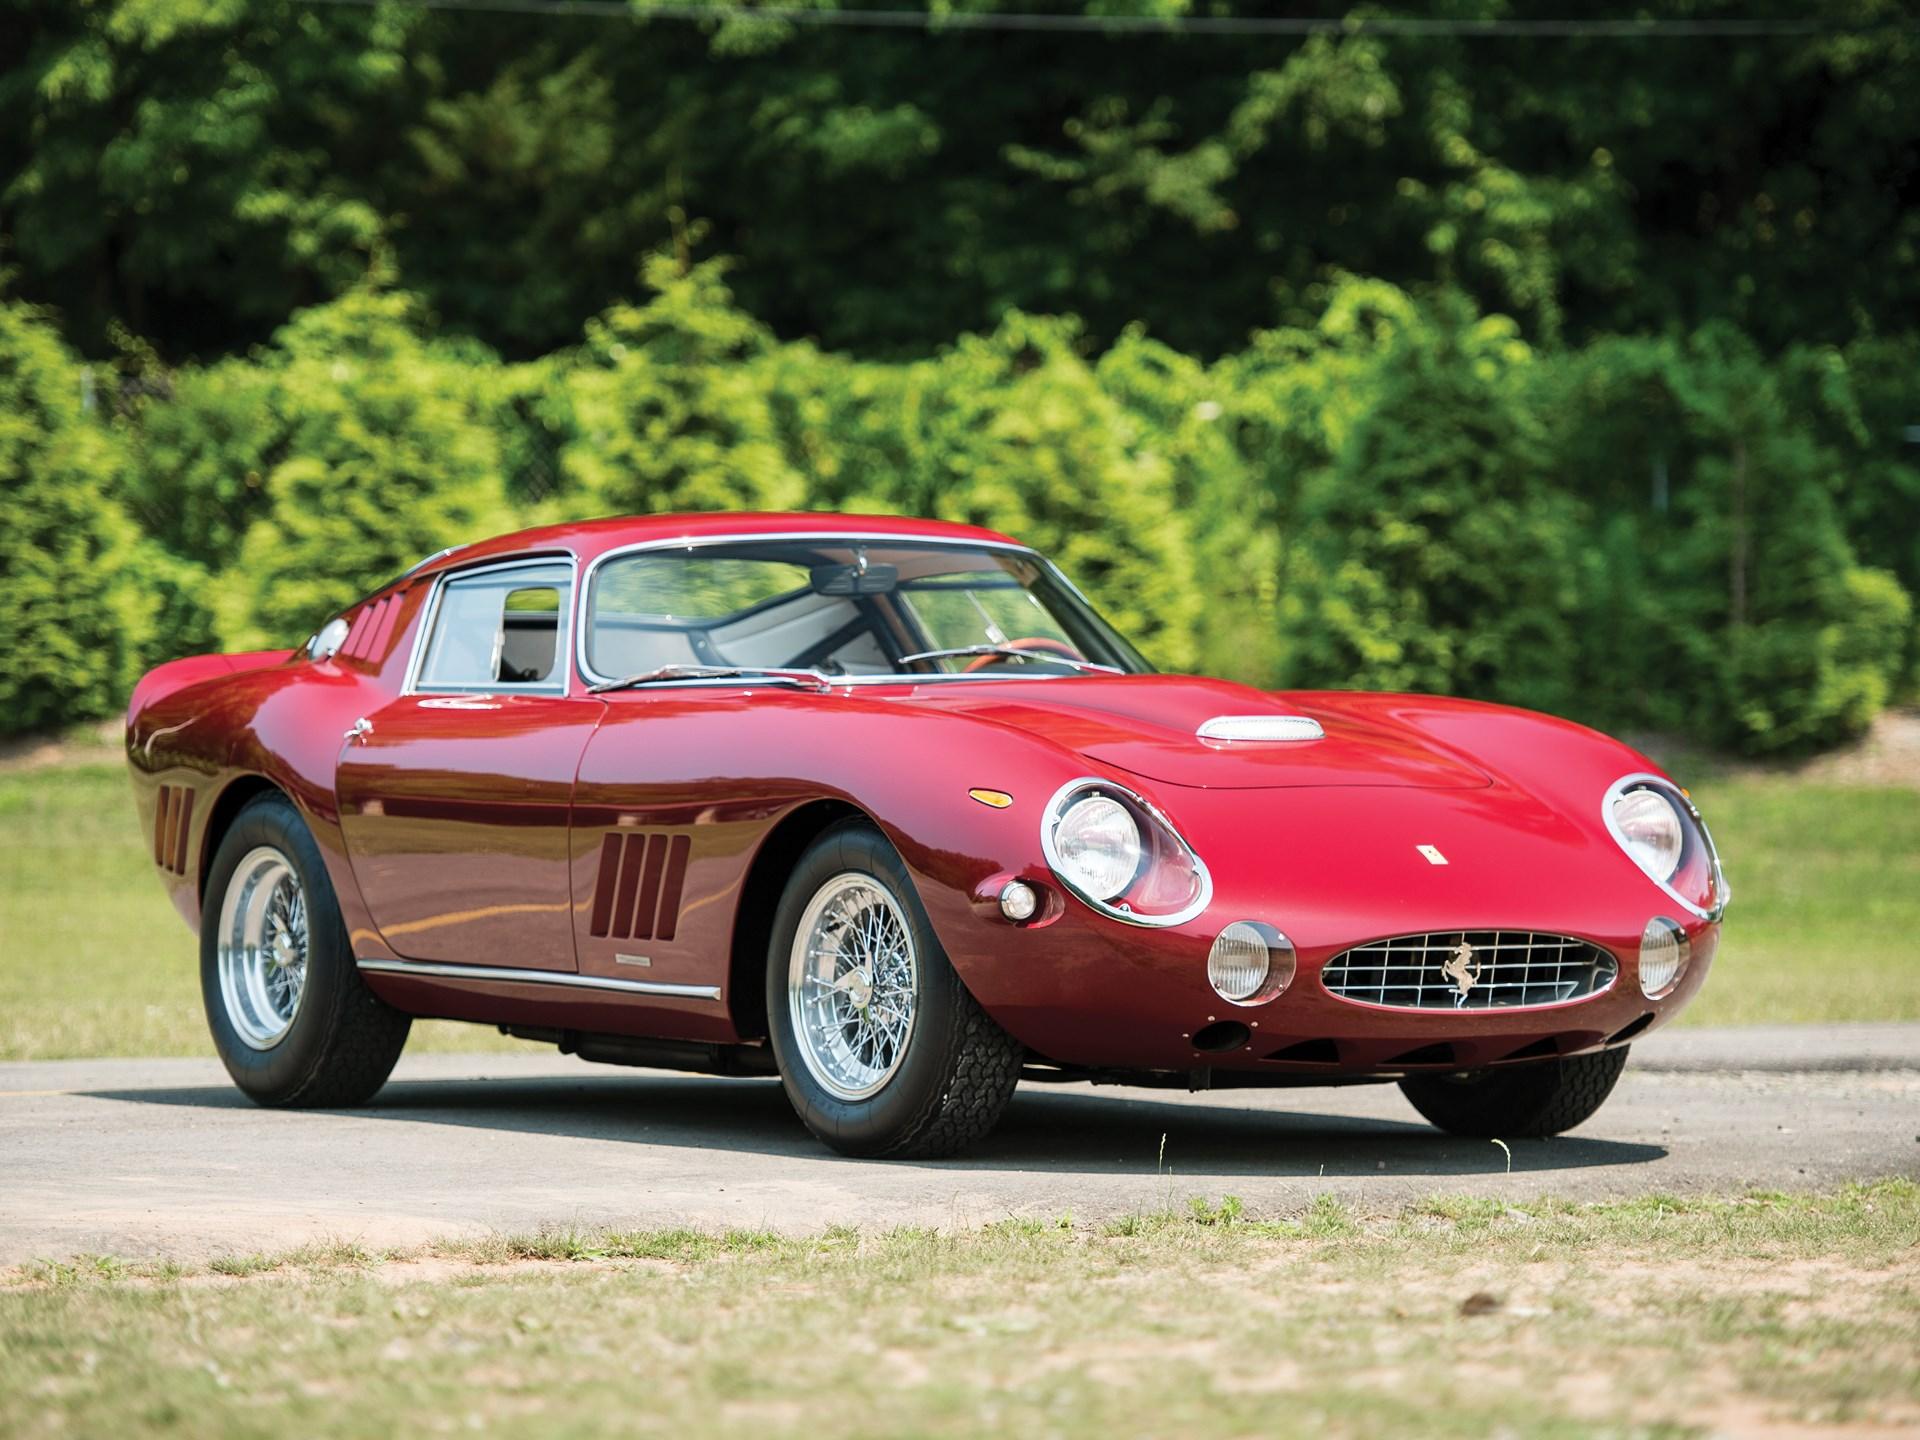 Ferrari 275 gtb 4 price